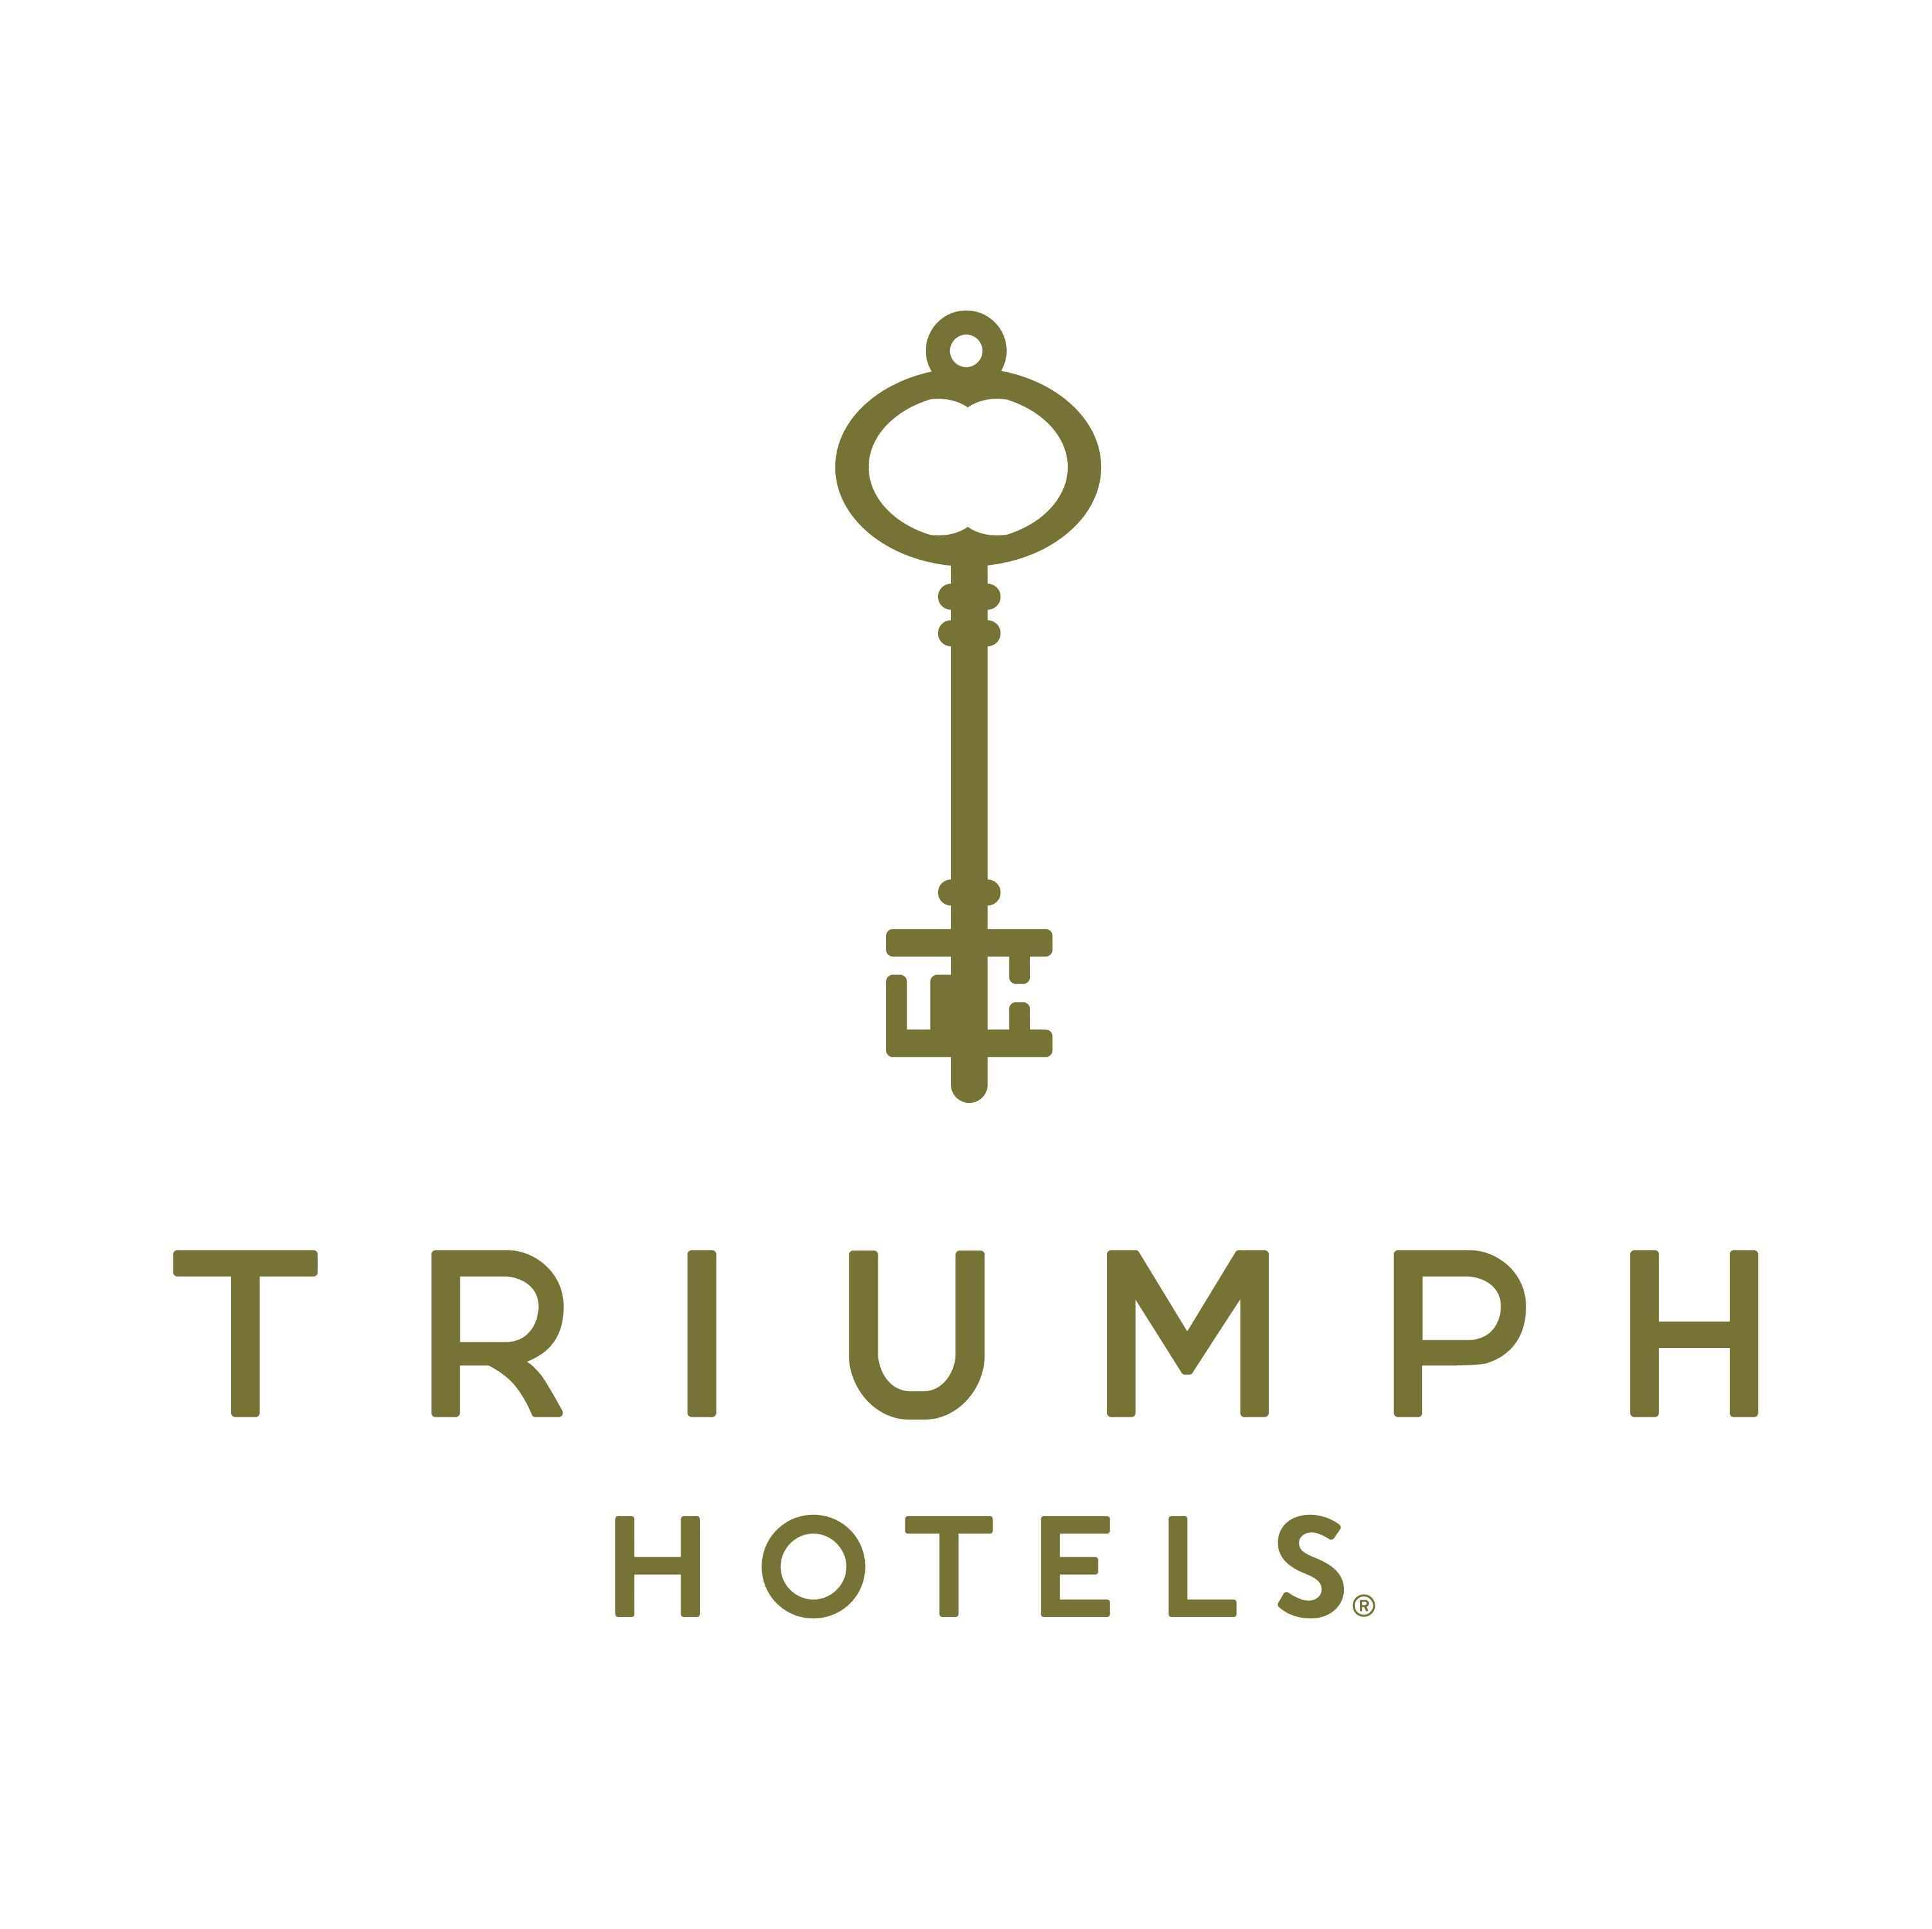 @TriumphHotels